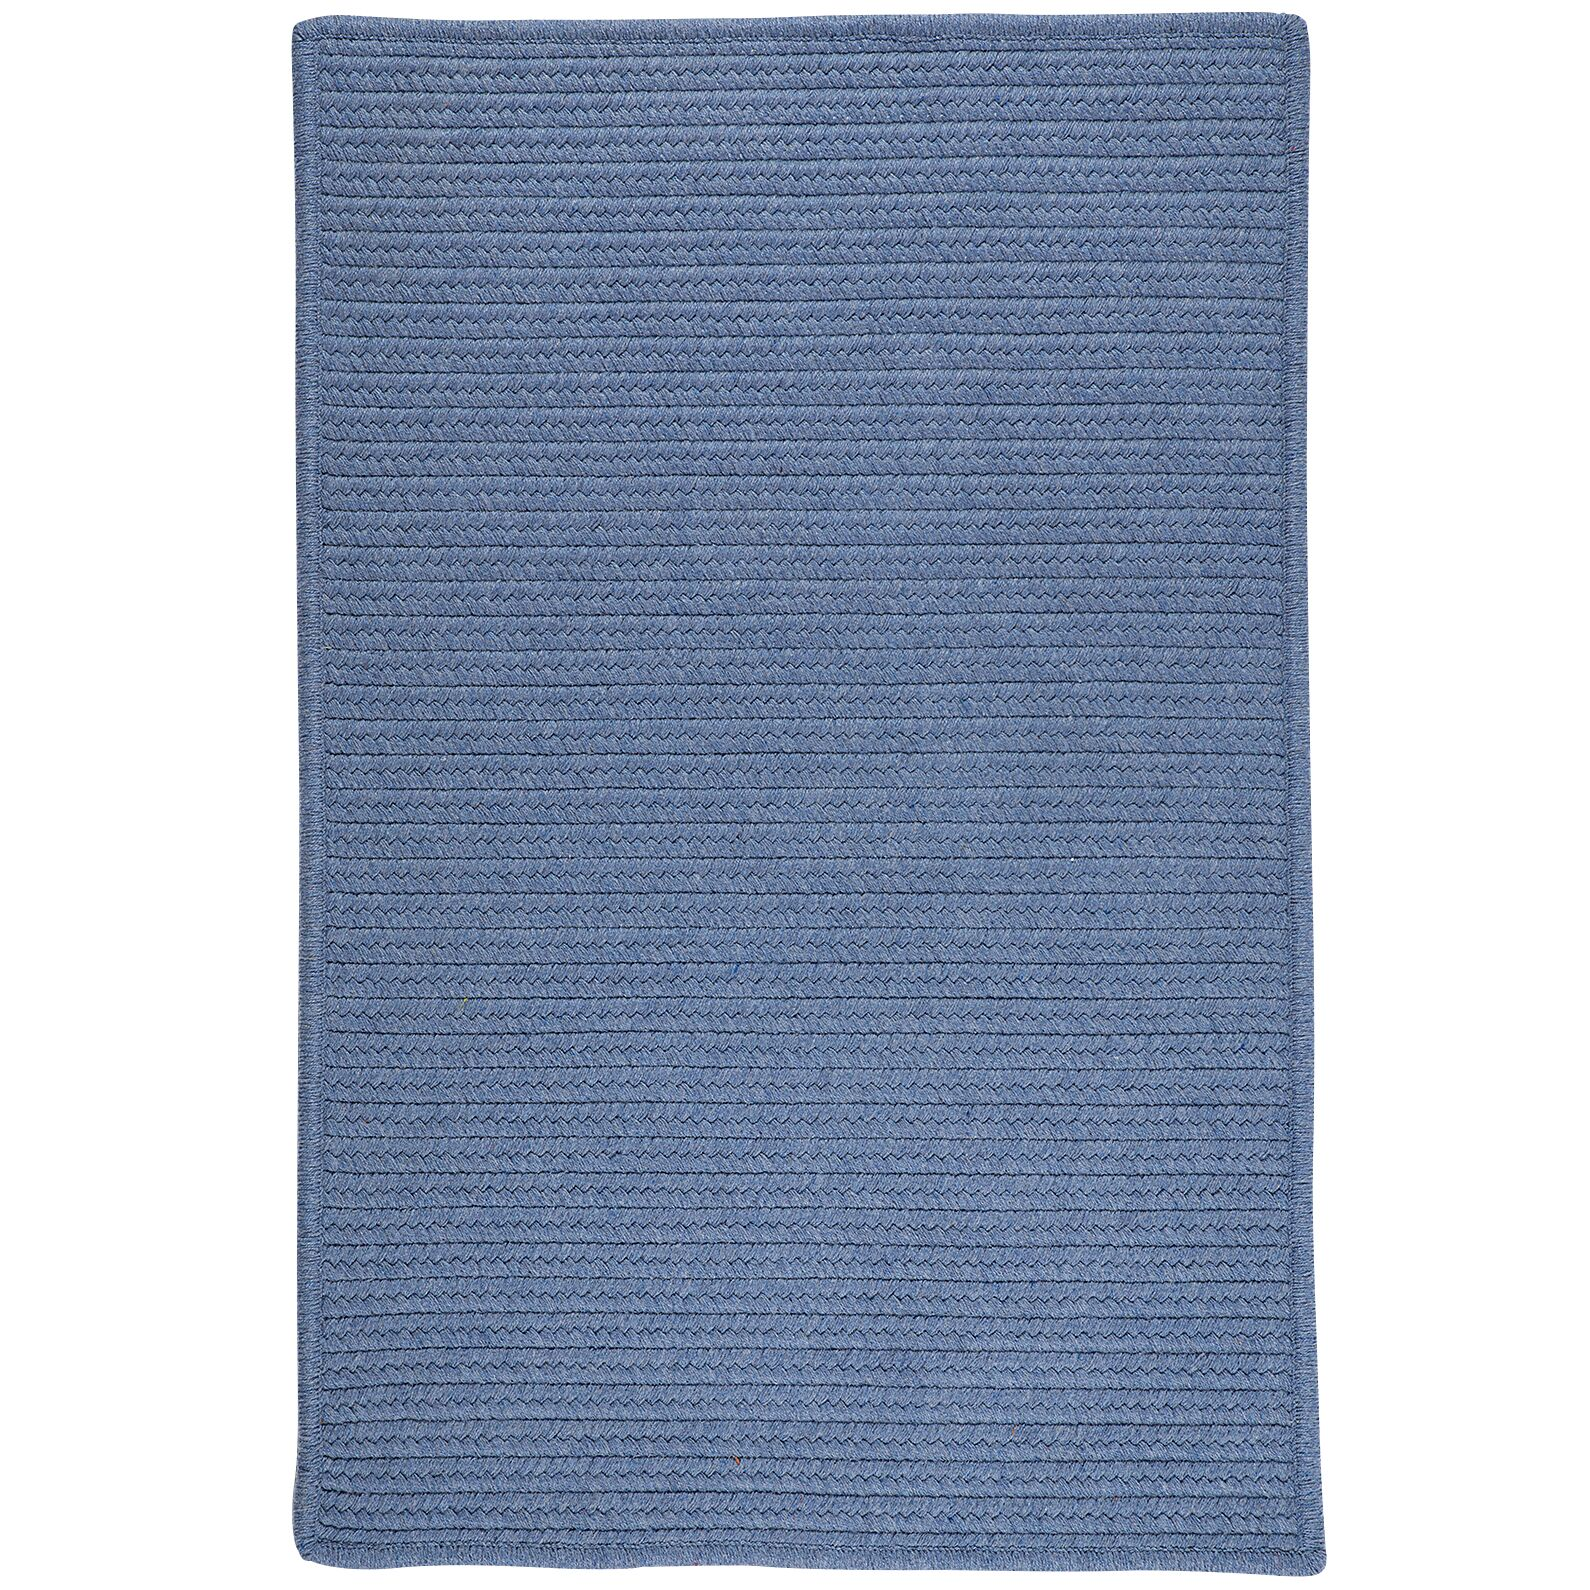 Hopseed Hand-Woven Blue Indoor/Outdoor Area Rug Rug Size: 8' x 10'